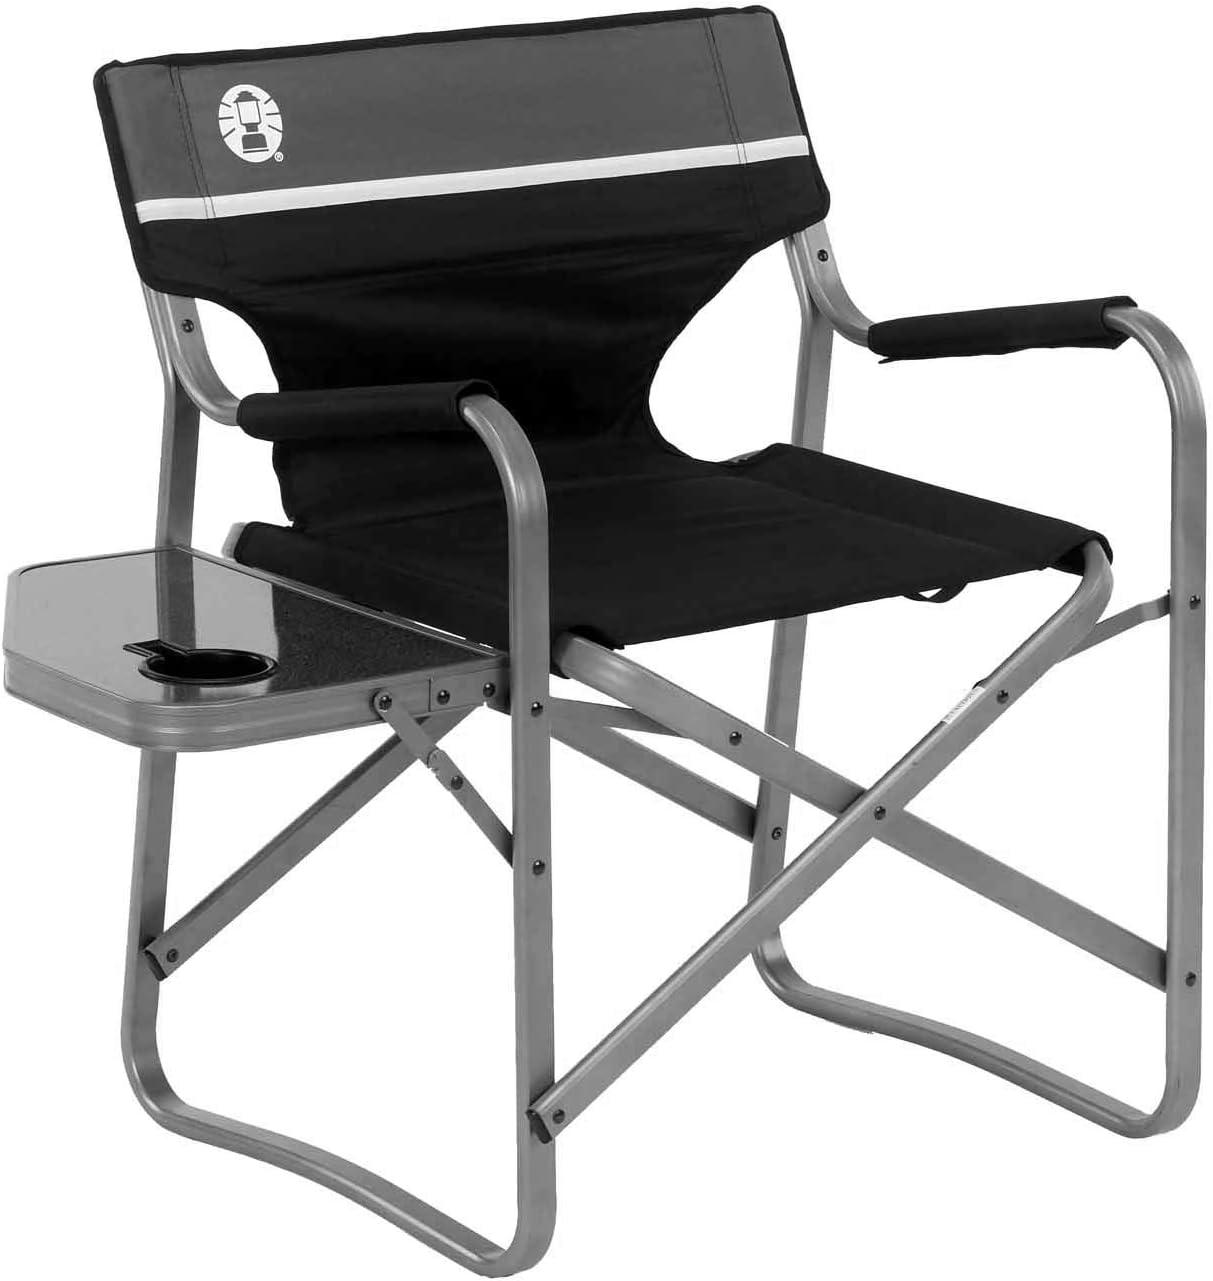 Budget Friendly Lawn Chair